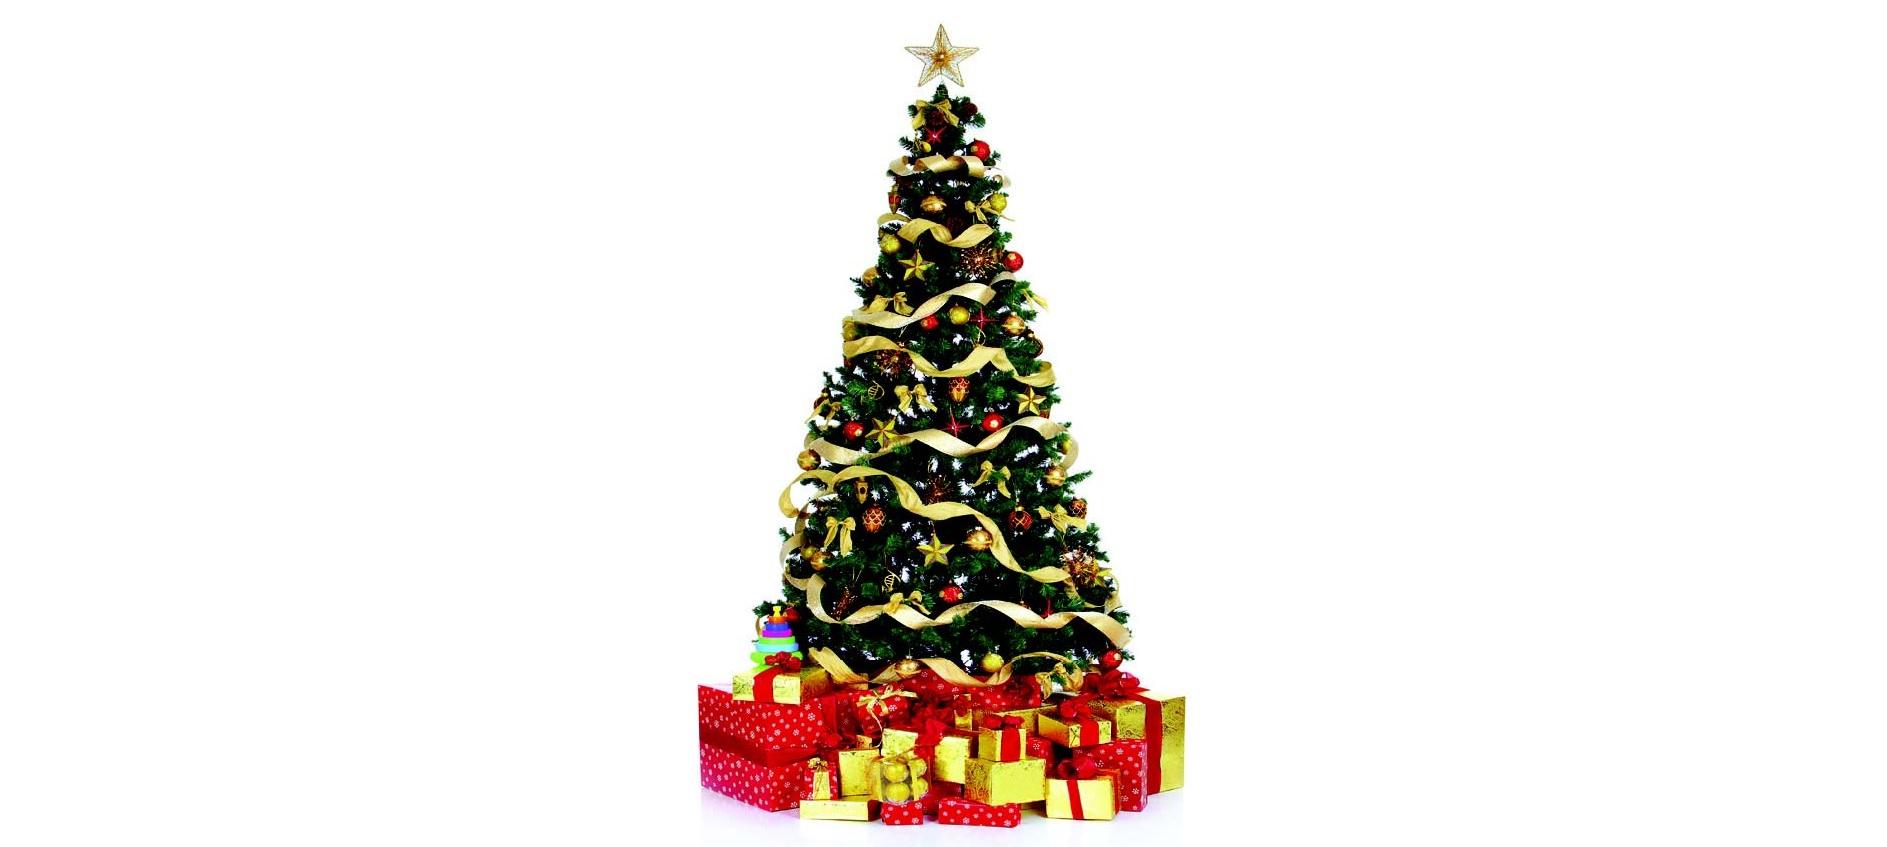 Christmas tree lighting set for Thursday at City Park   Copperas ...